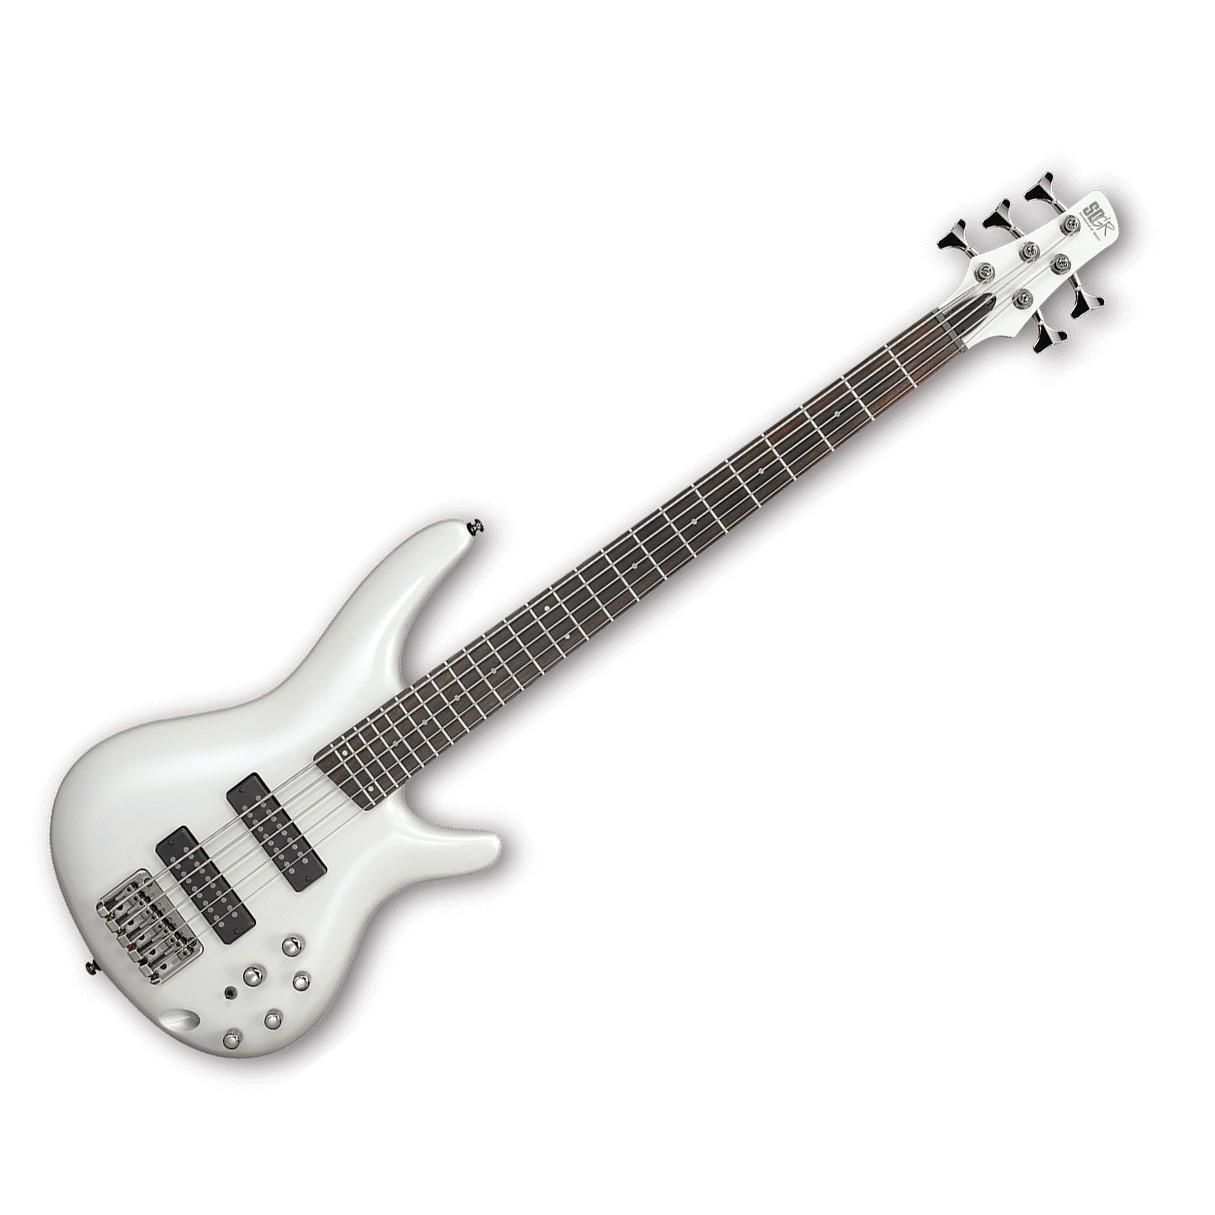 ibanez sr305e 5 string electric bass pearl white. Black Bedroom Furniture Sets. Home Design Ideas